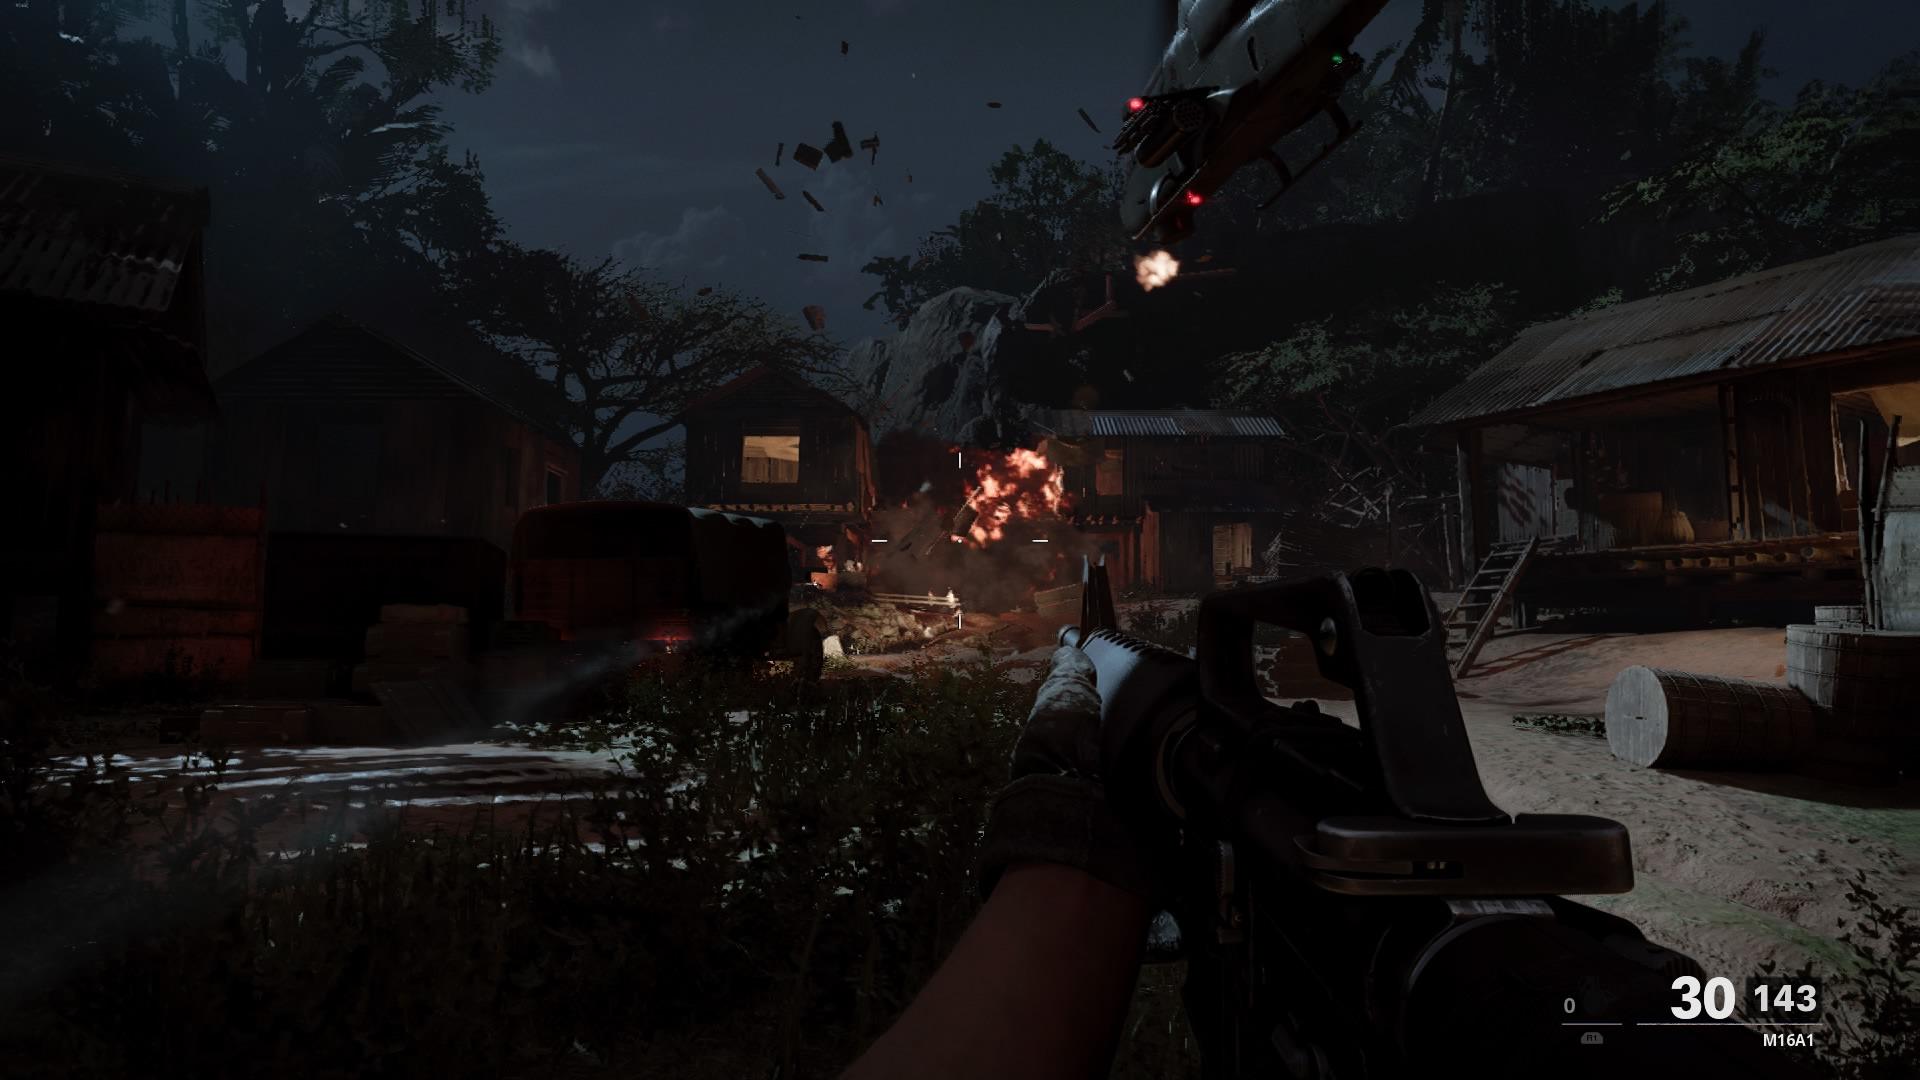 Recenze kampaně Call of Duty: Black Ops Cold War Call of Duty® Black Ops Cold War 20201113113905